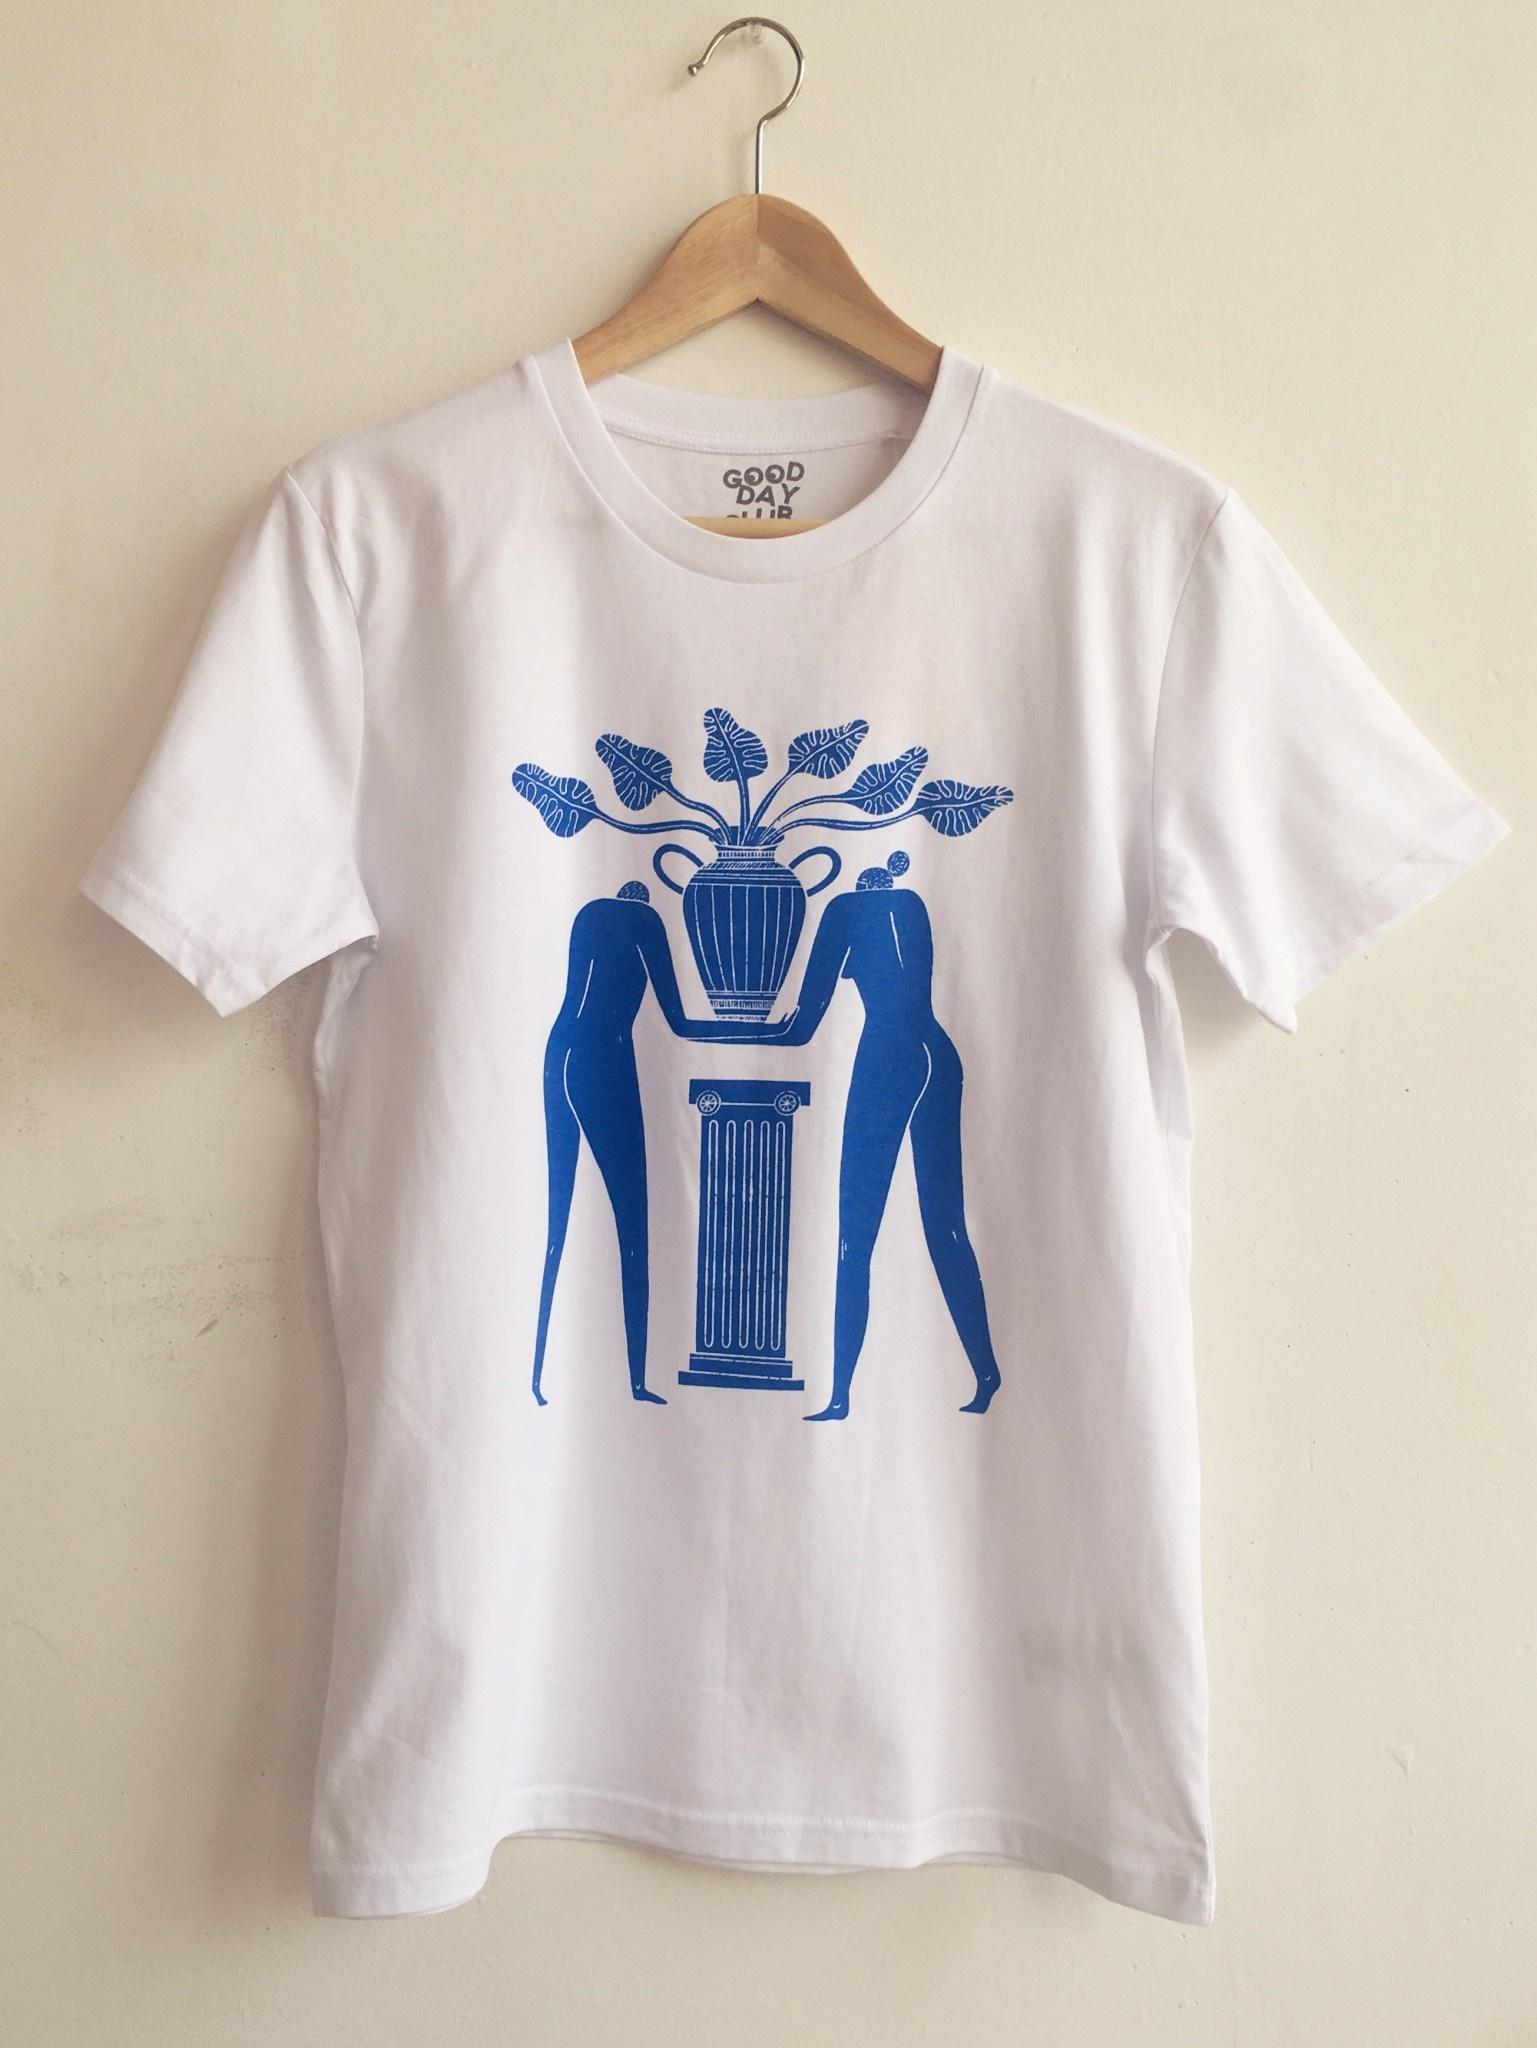 Good Day Club Mark Conlan T-shirt